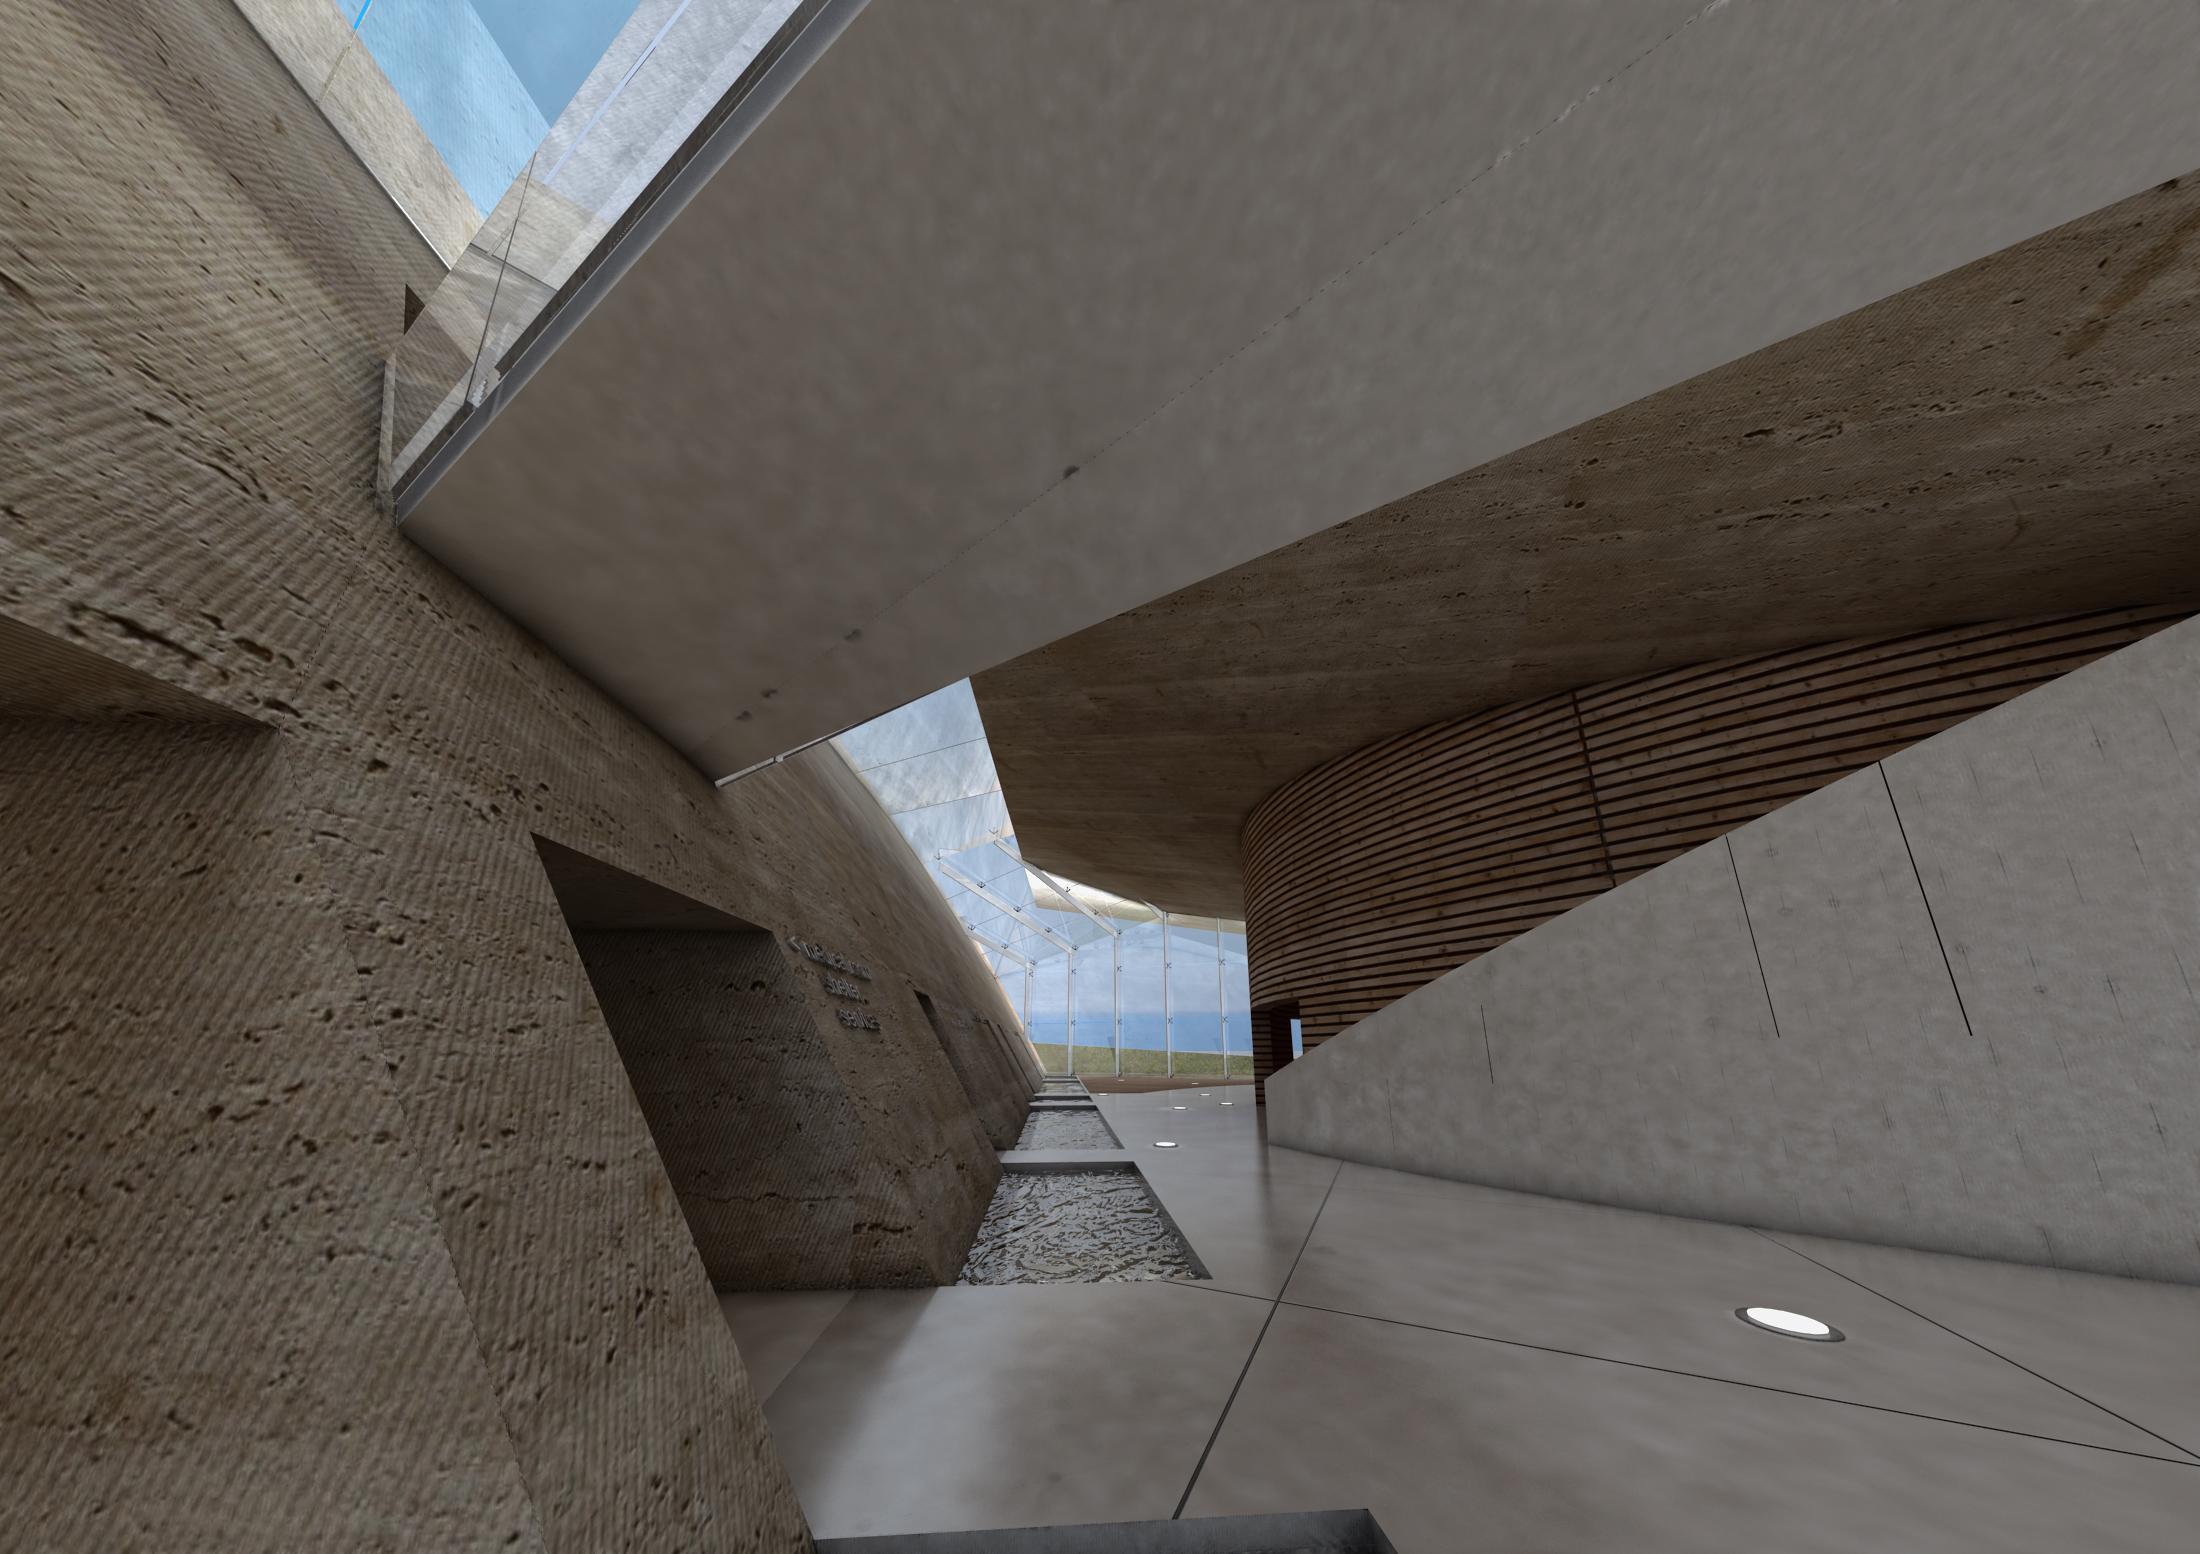 https://nbc-arhitect.ro/wp-content/uploads/2020/10/NBC-Arhitect-_-contests-_-Thyssenkrupp-Elevator-Arhitecture-Award-Istanbul-_-Istanbul_11.jpg